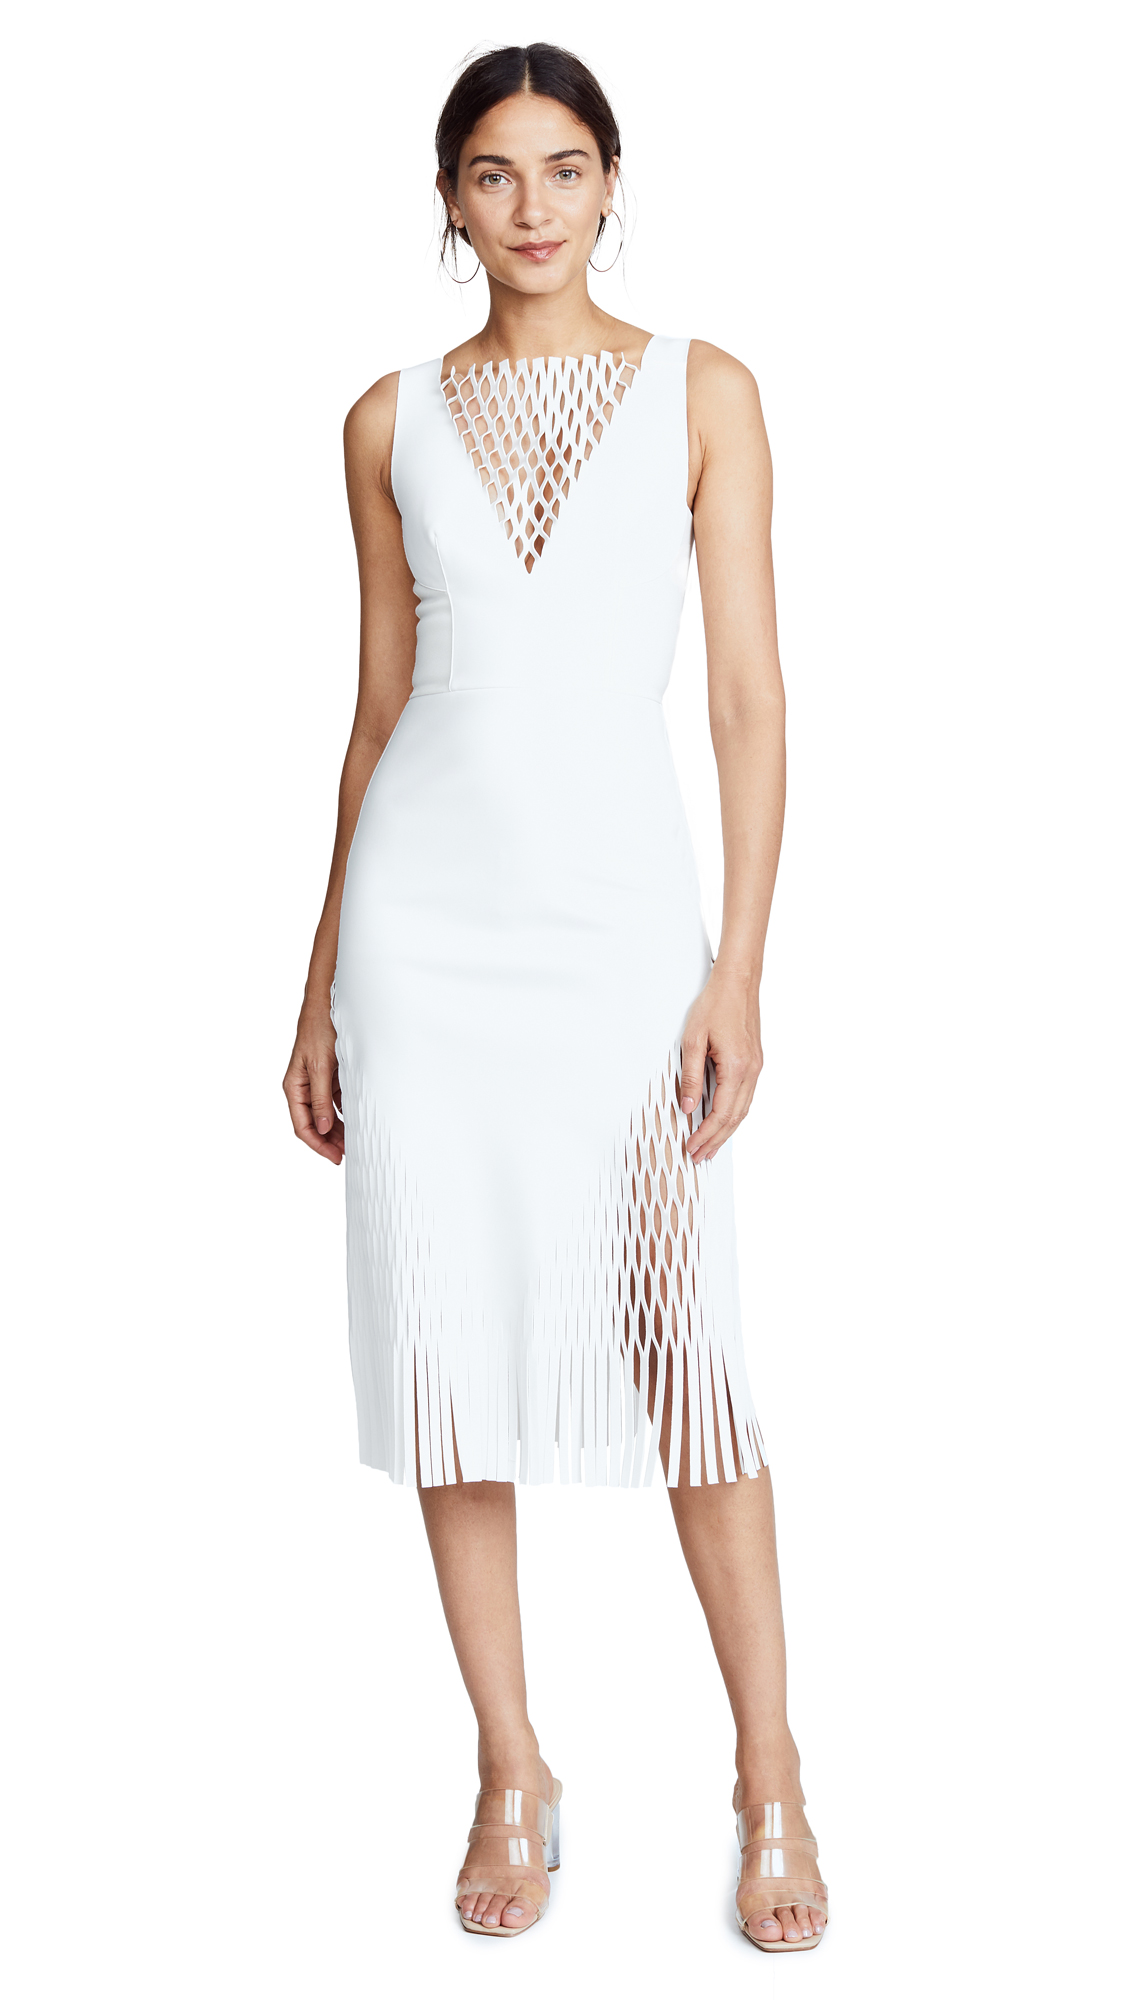 Dion Lee Mirror Dress In Ivory